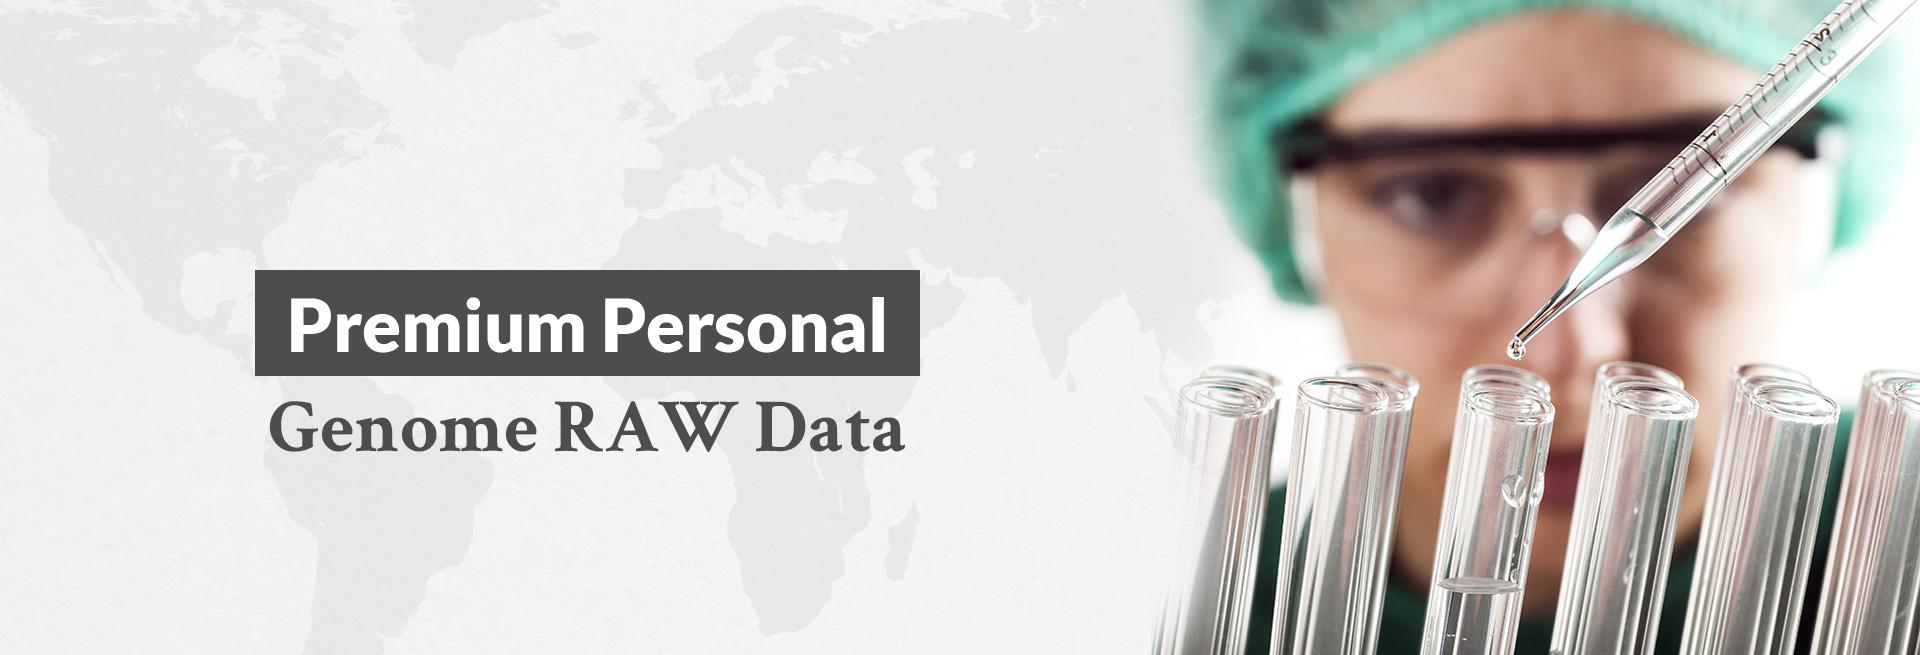 Premium Personal Genome RAW Data